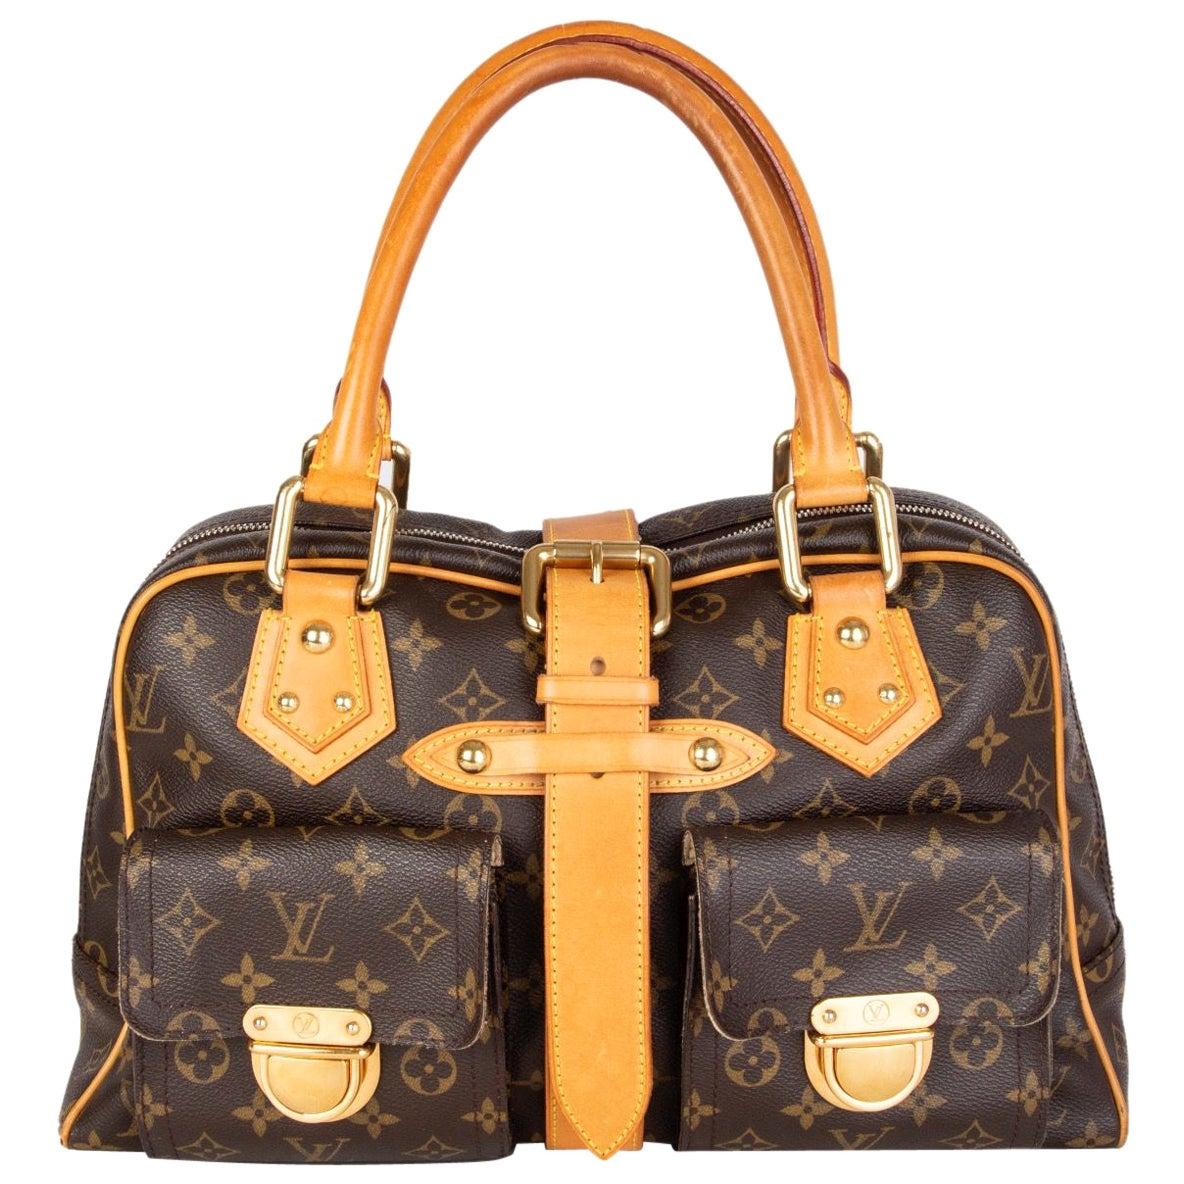 LOUIS VUITTON brown Monogram canvas MANHATTAN GM Shoulder Bag